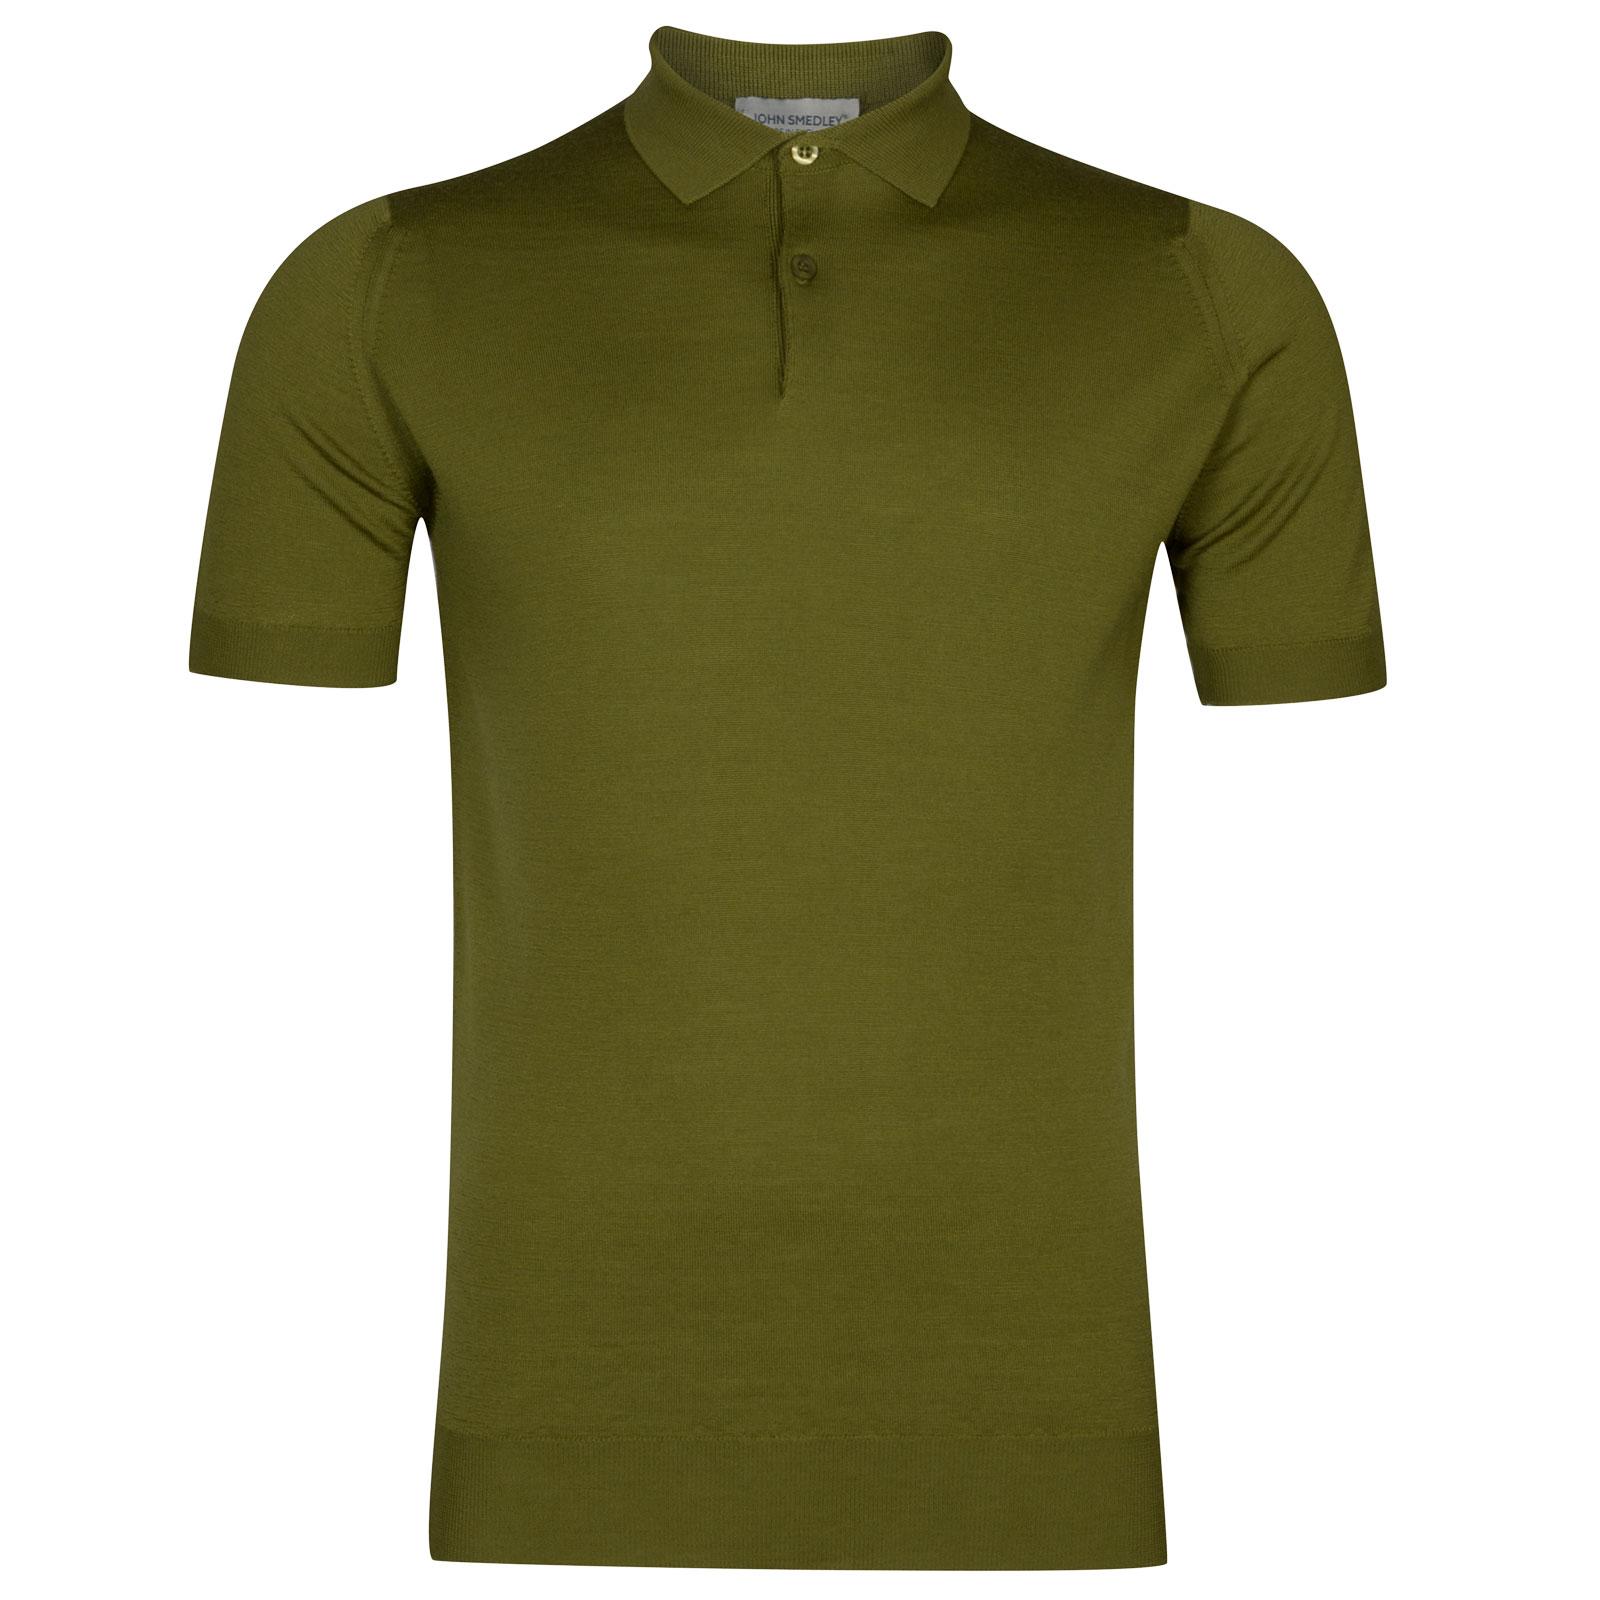 John Smedley payton Merino Wool Shirt in Lumsdale Green-L